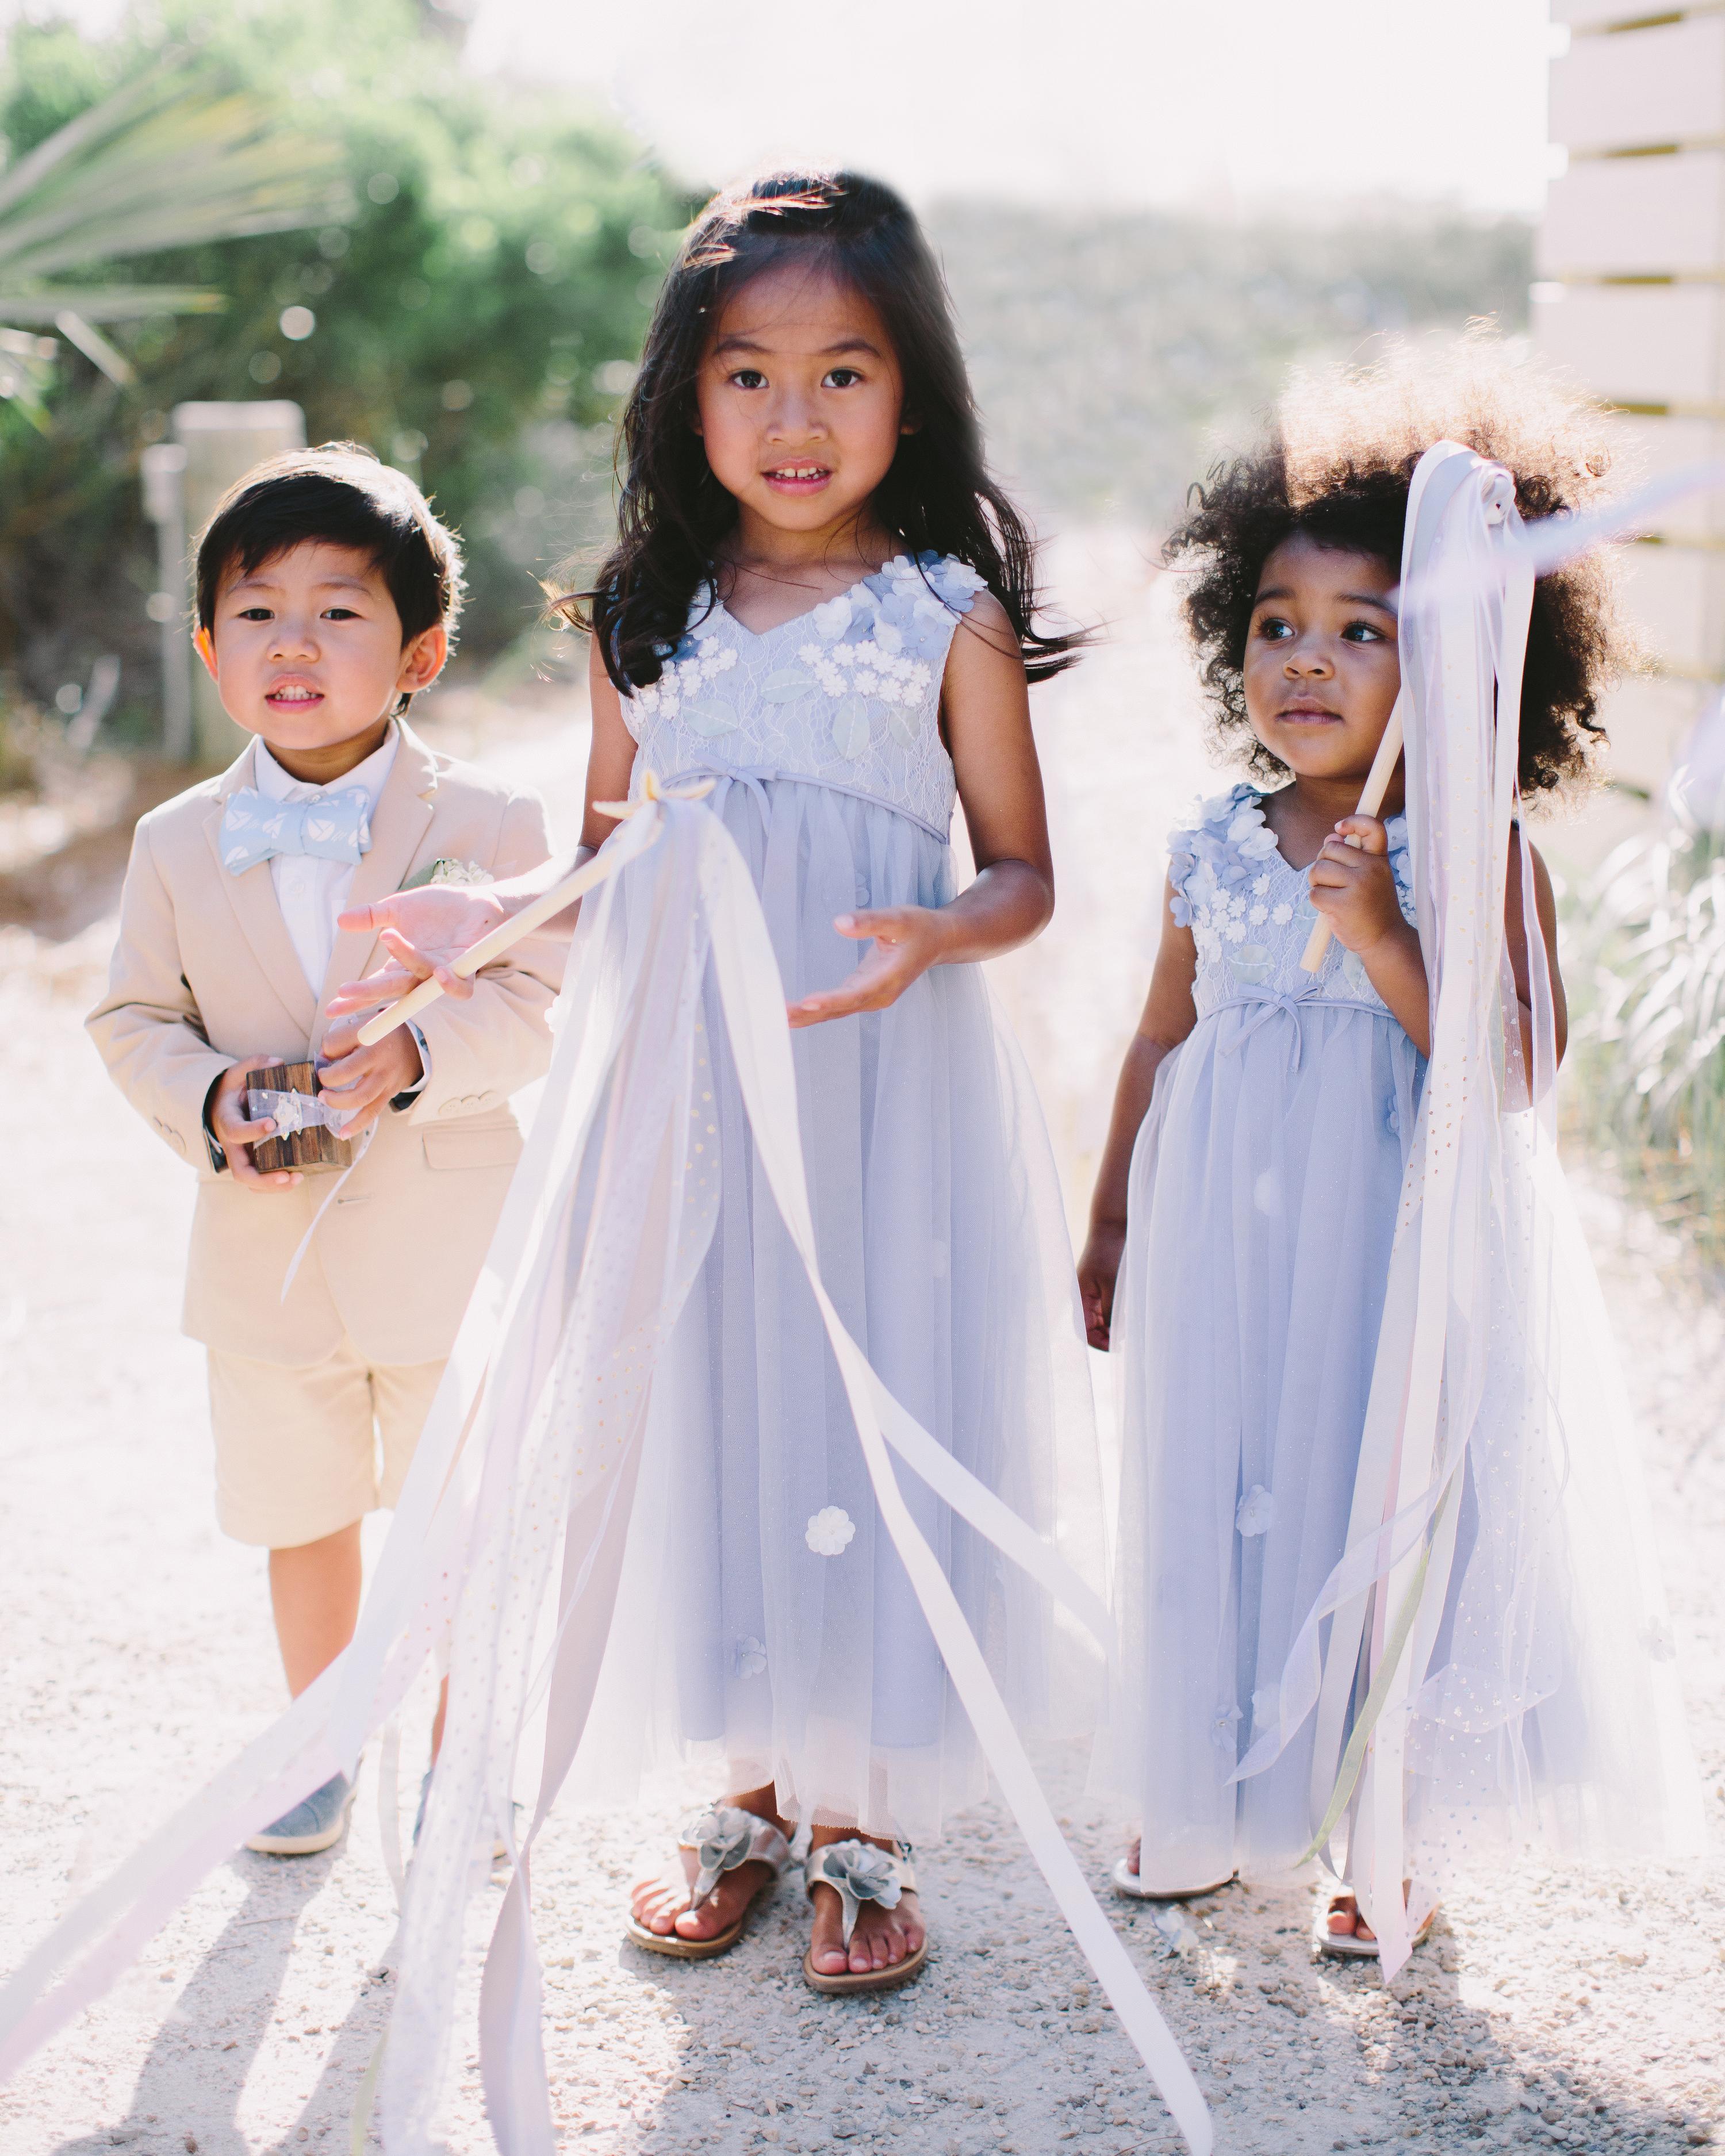 teresa-amanda-wedding-kids-9709-s111694-1114.jpg